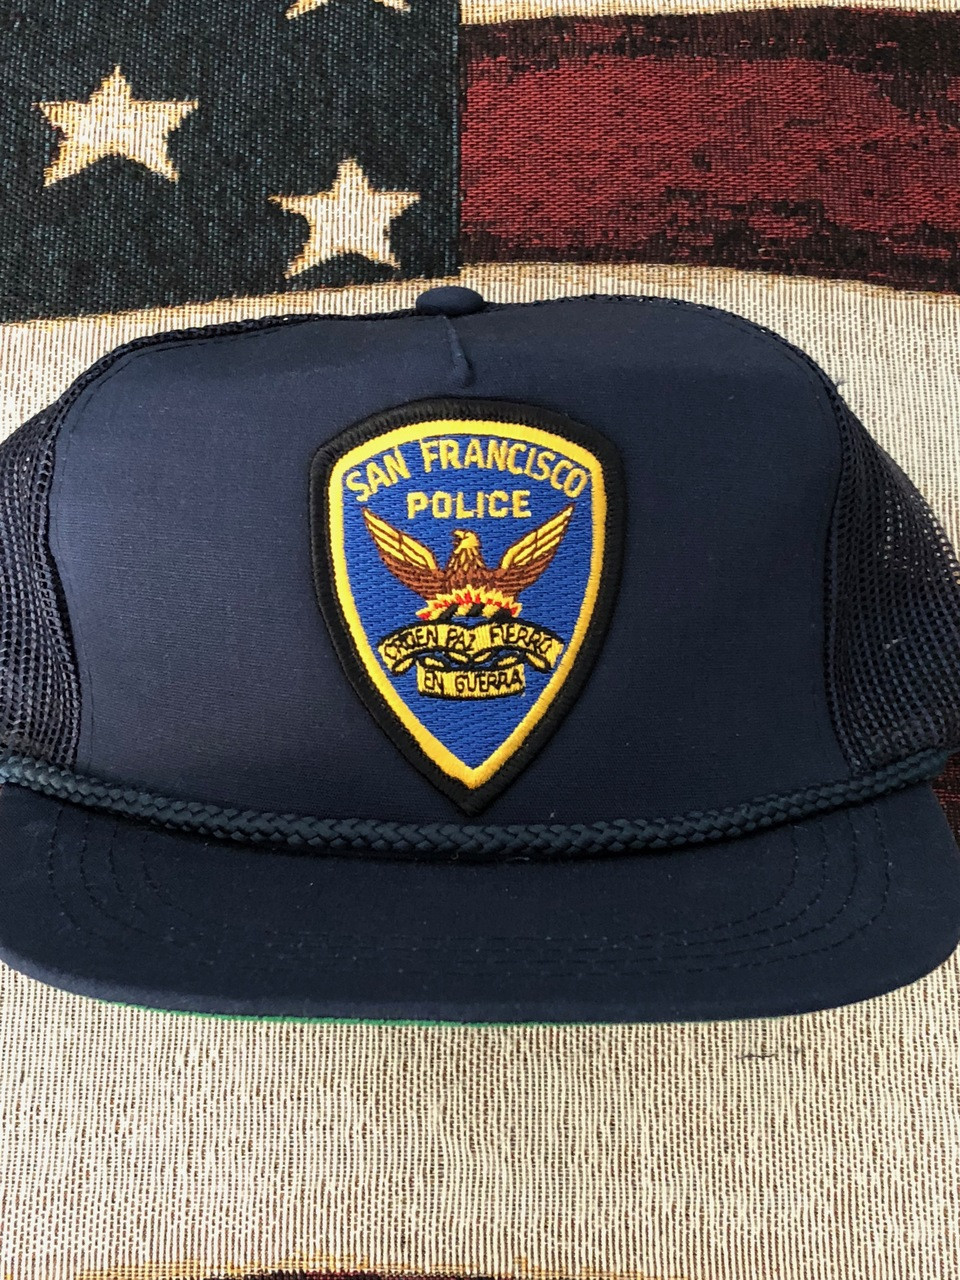 police patch holder